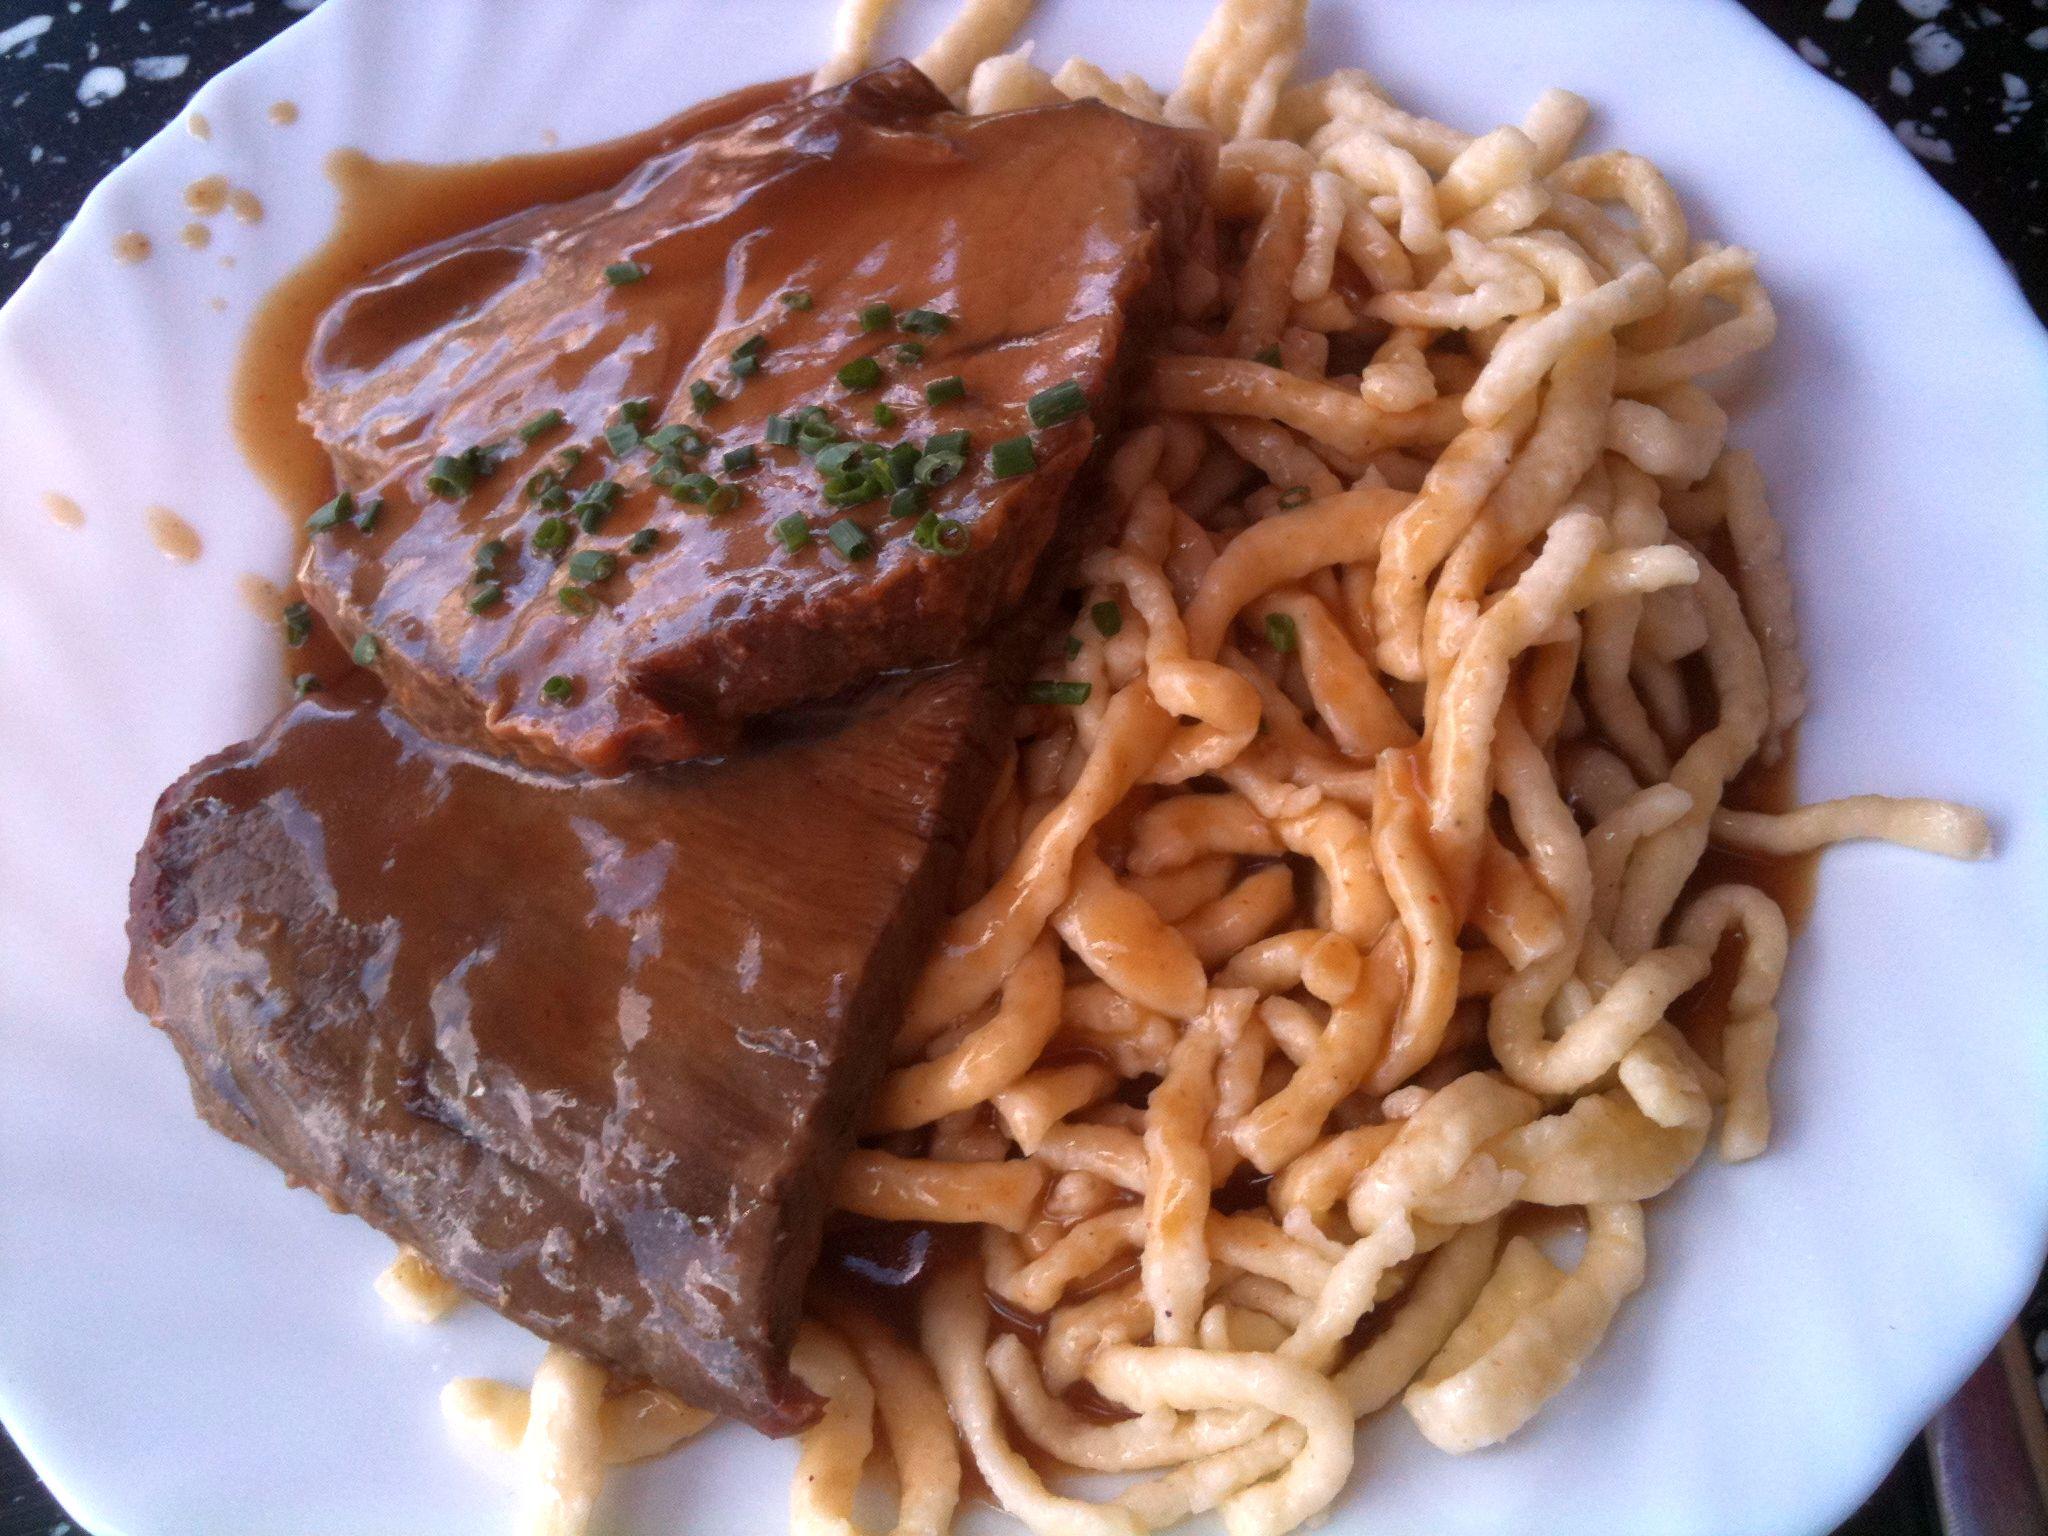 https://foodloader.net/nico_2011-07-09_gemischter_braten-mit-spaetzle.jpg